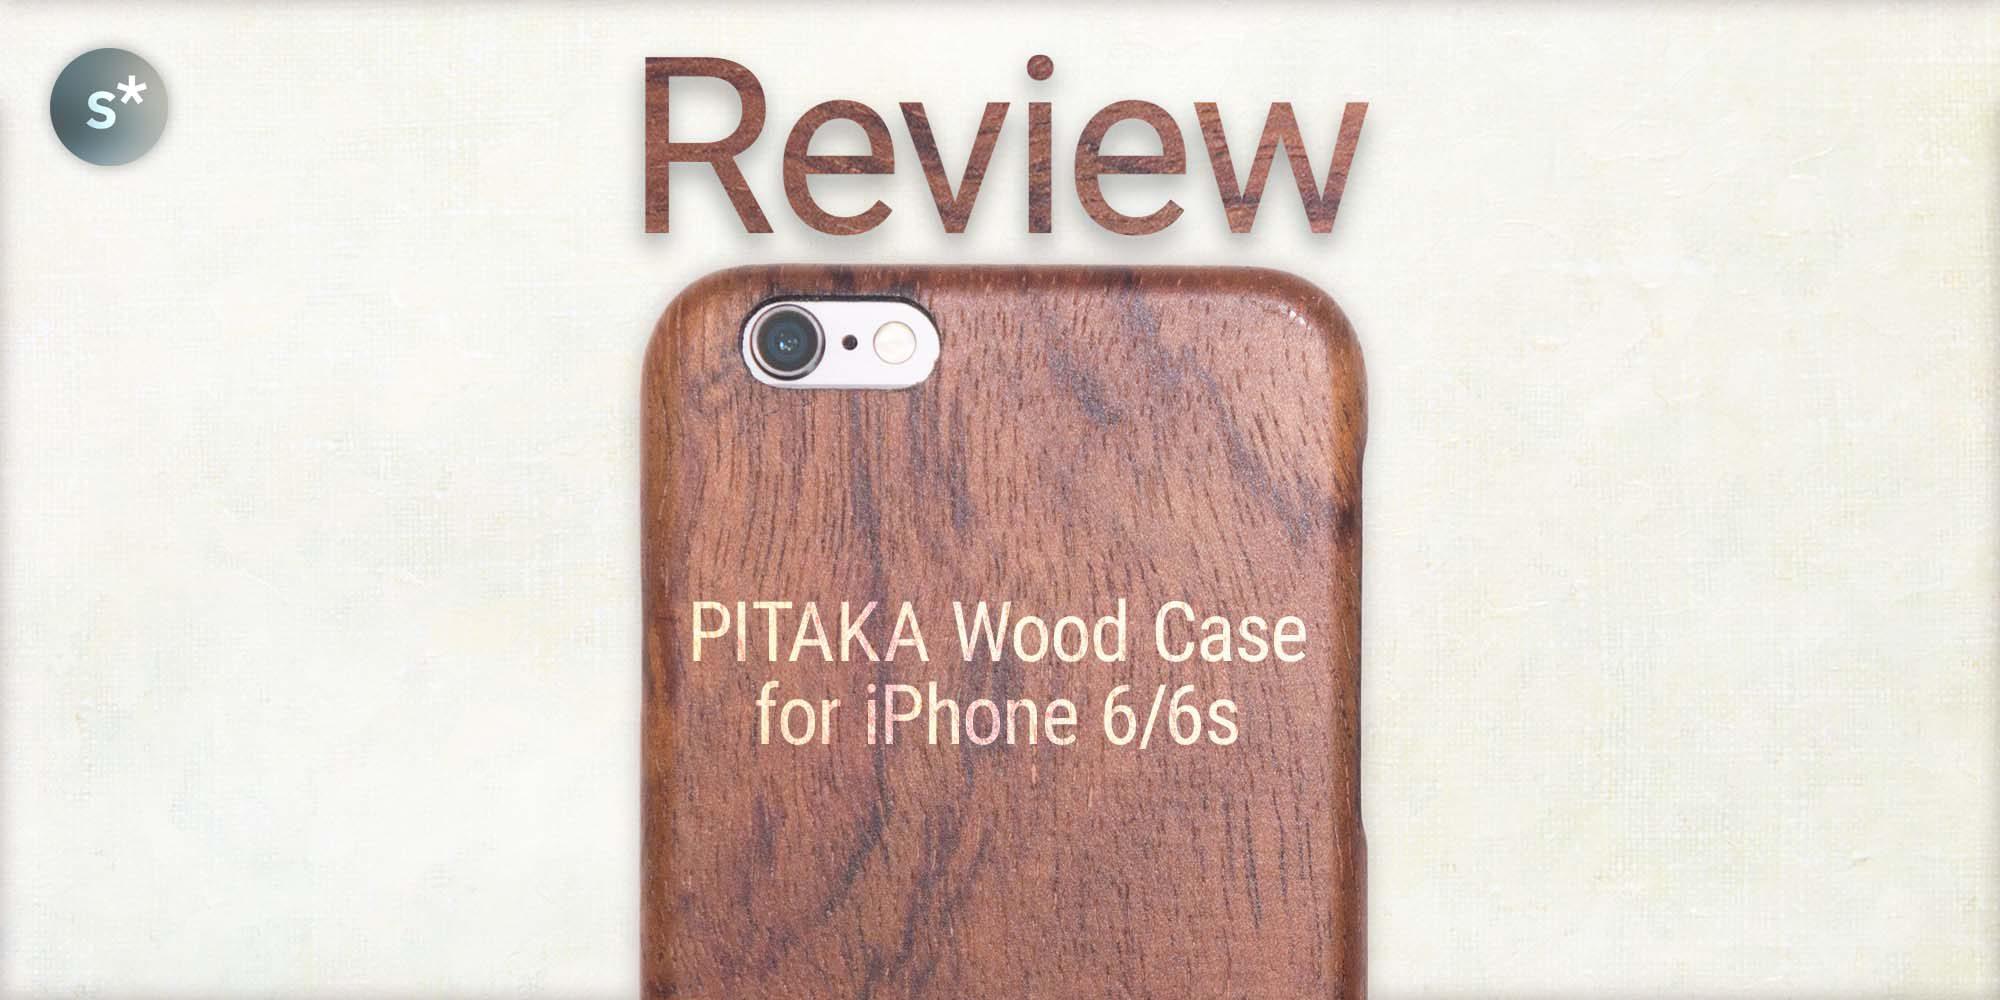 online store c6a2c 42ab2 iPhone 6/6s用の木製ケース「PITAKA Wood Case」ローズウッドモデルの ...